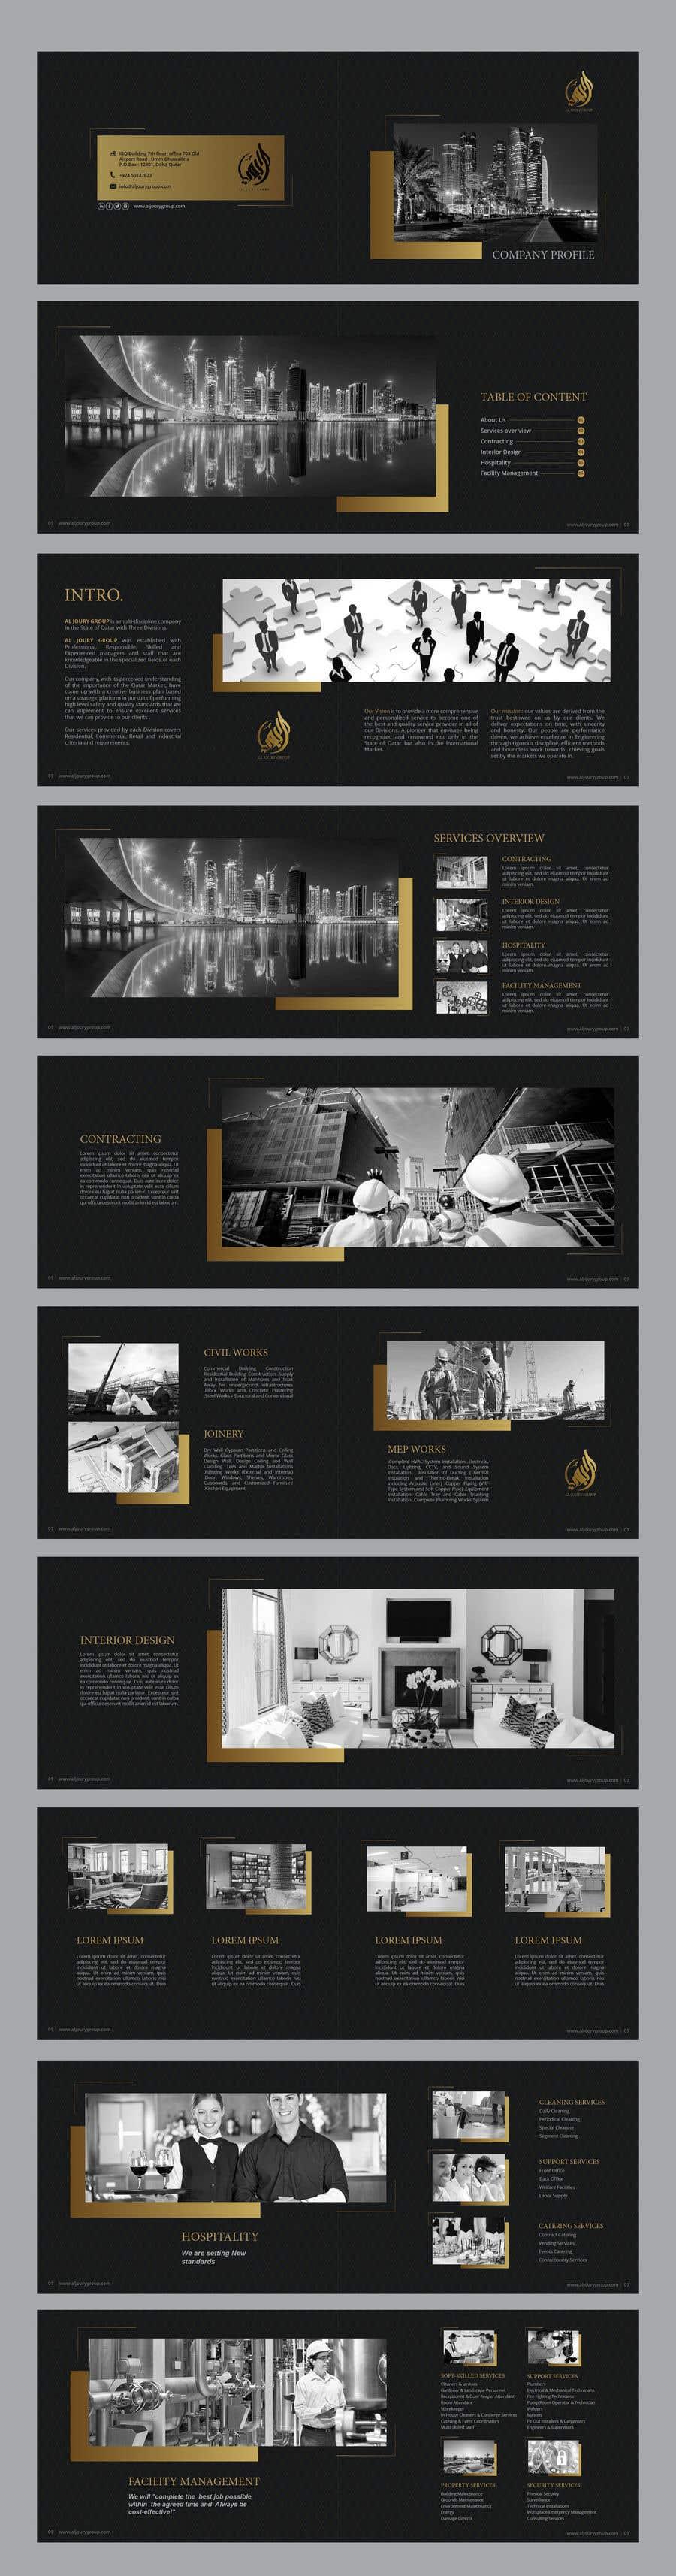 Design company's profile/brochure | Freelancer